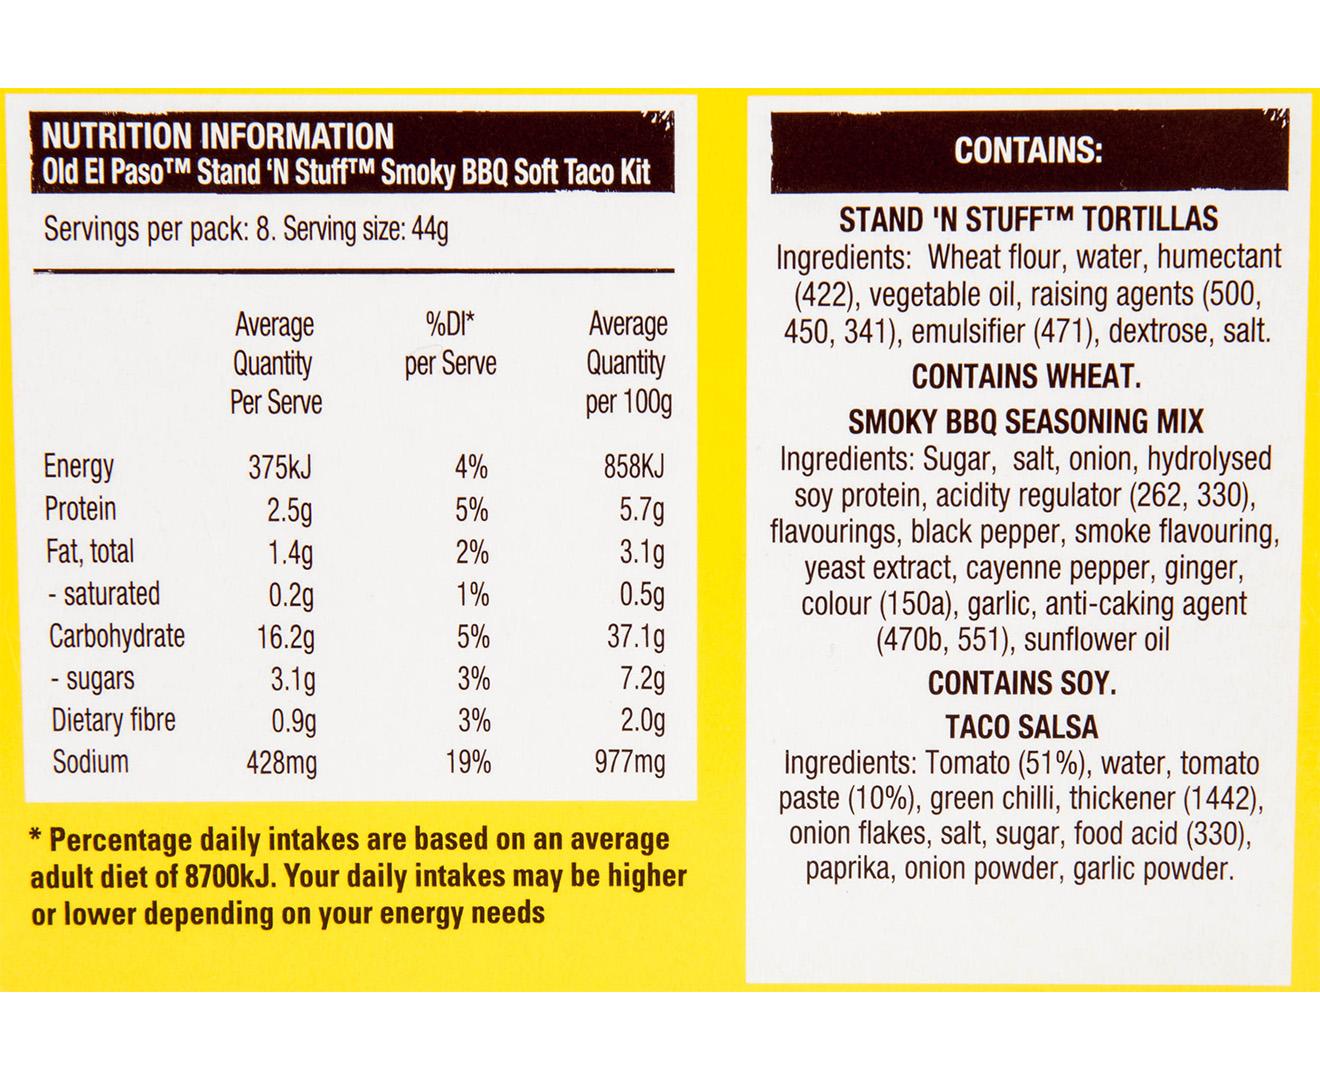 old el paso soft taco kit instructions